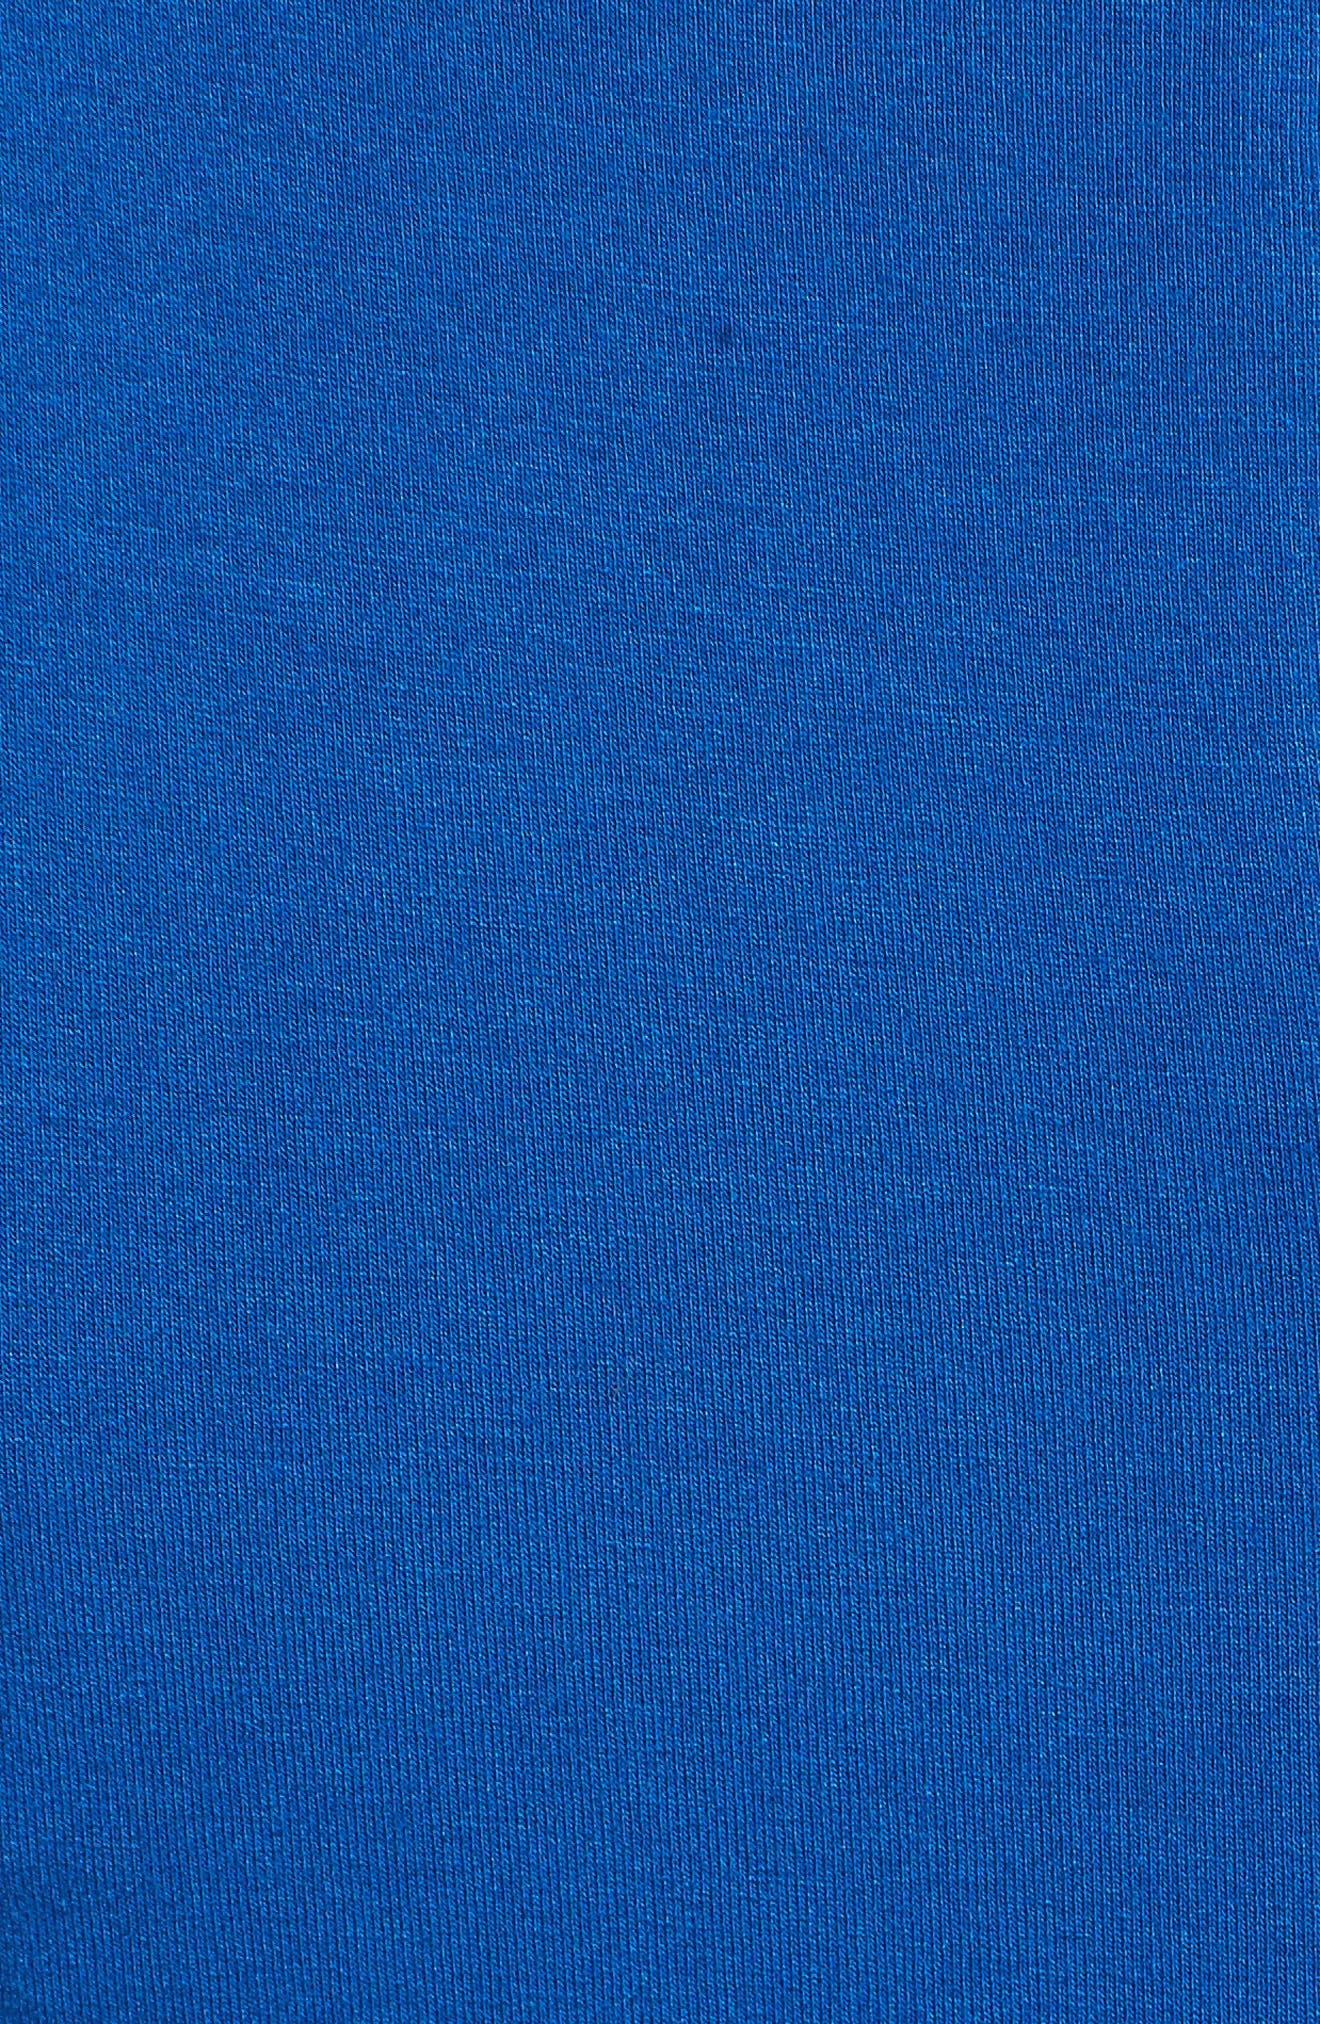 Chiffon Overlay Maxi Dress,                             Alternate thumbnail 6, color,                             Amalfi Blue